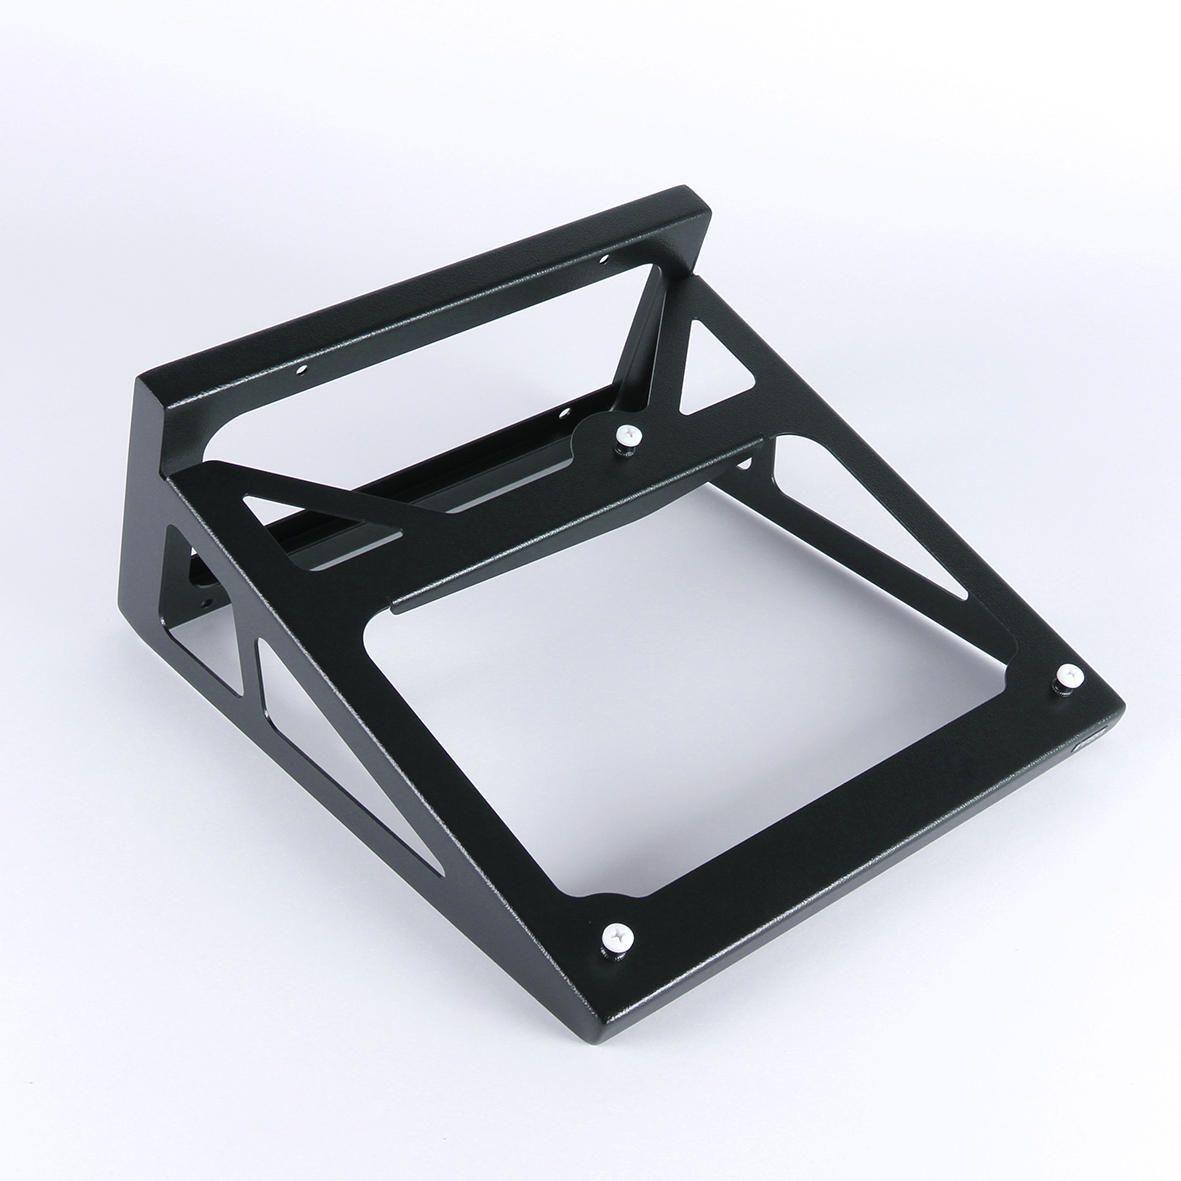 Rega Turntable Wallbracket for all models (expect P 8 und P10) black